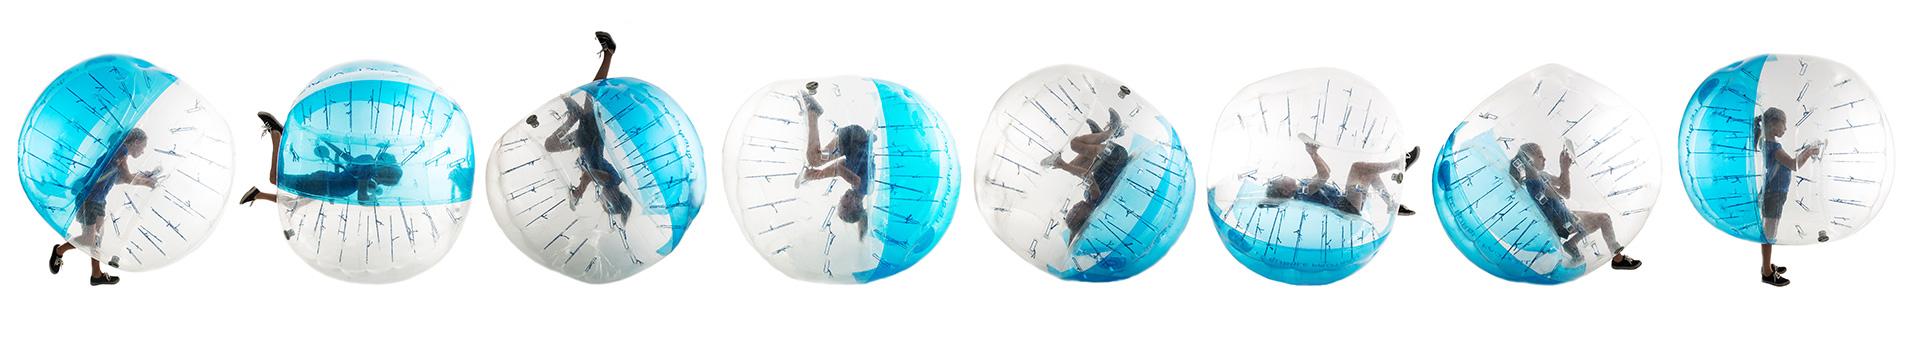 bubble-football-bulles-8